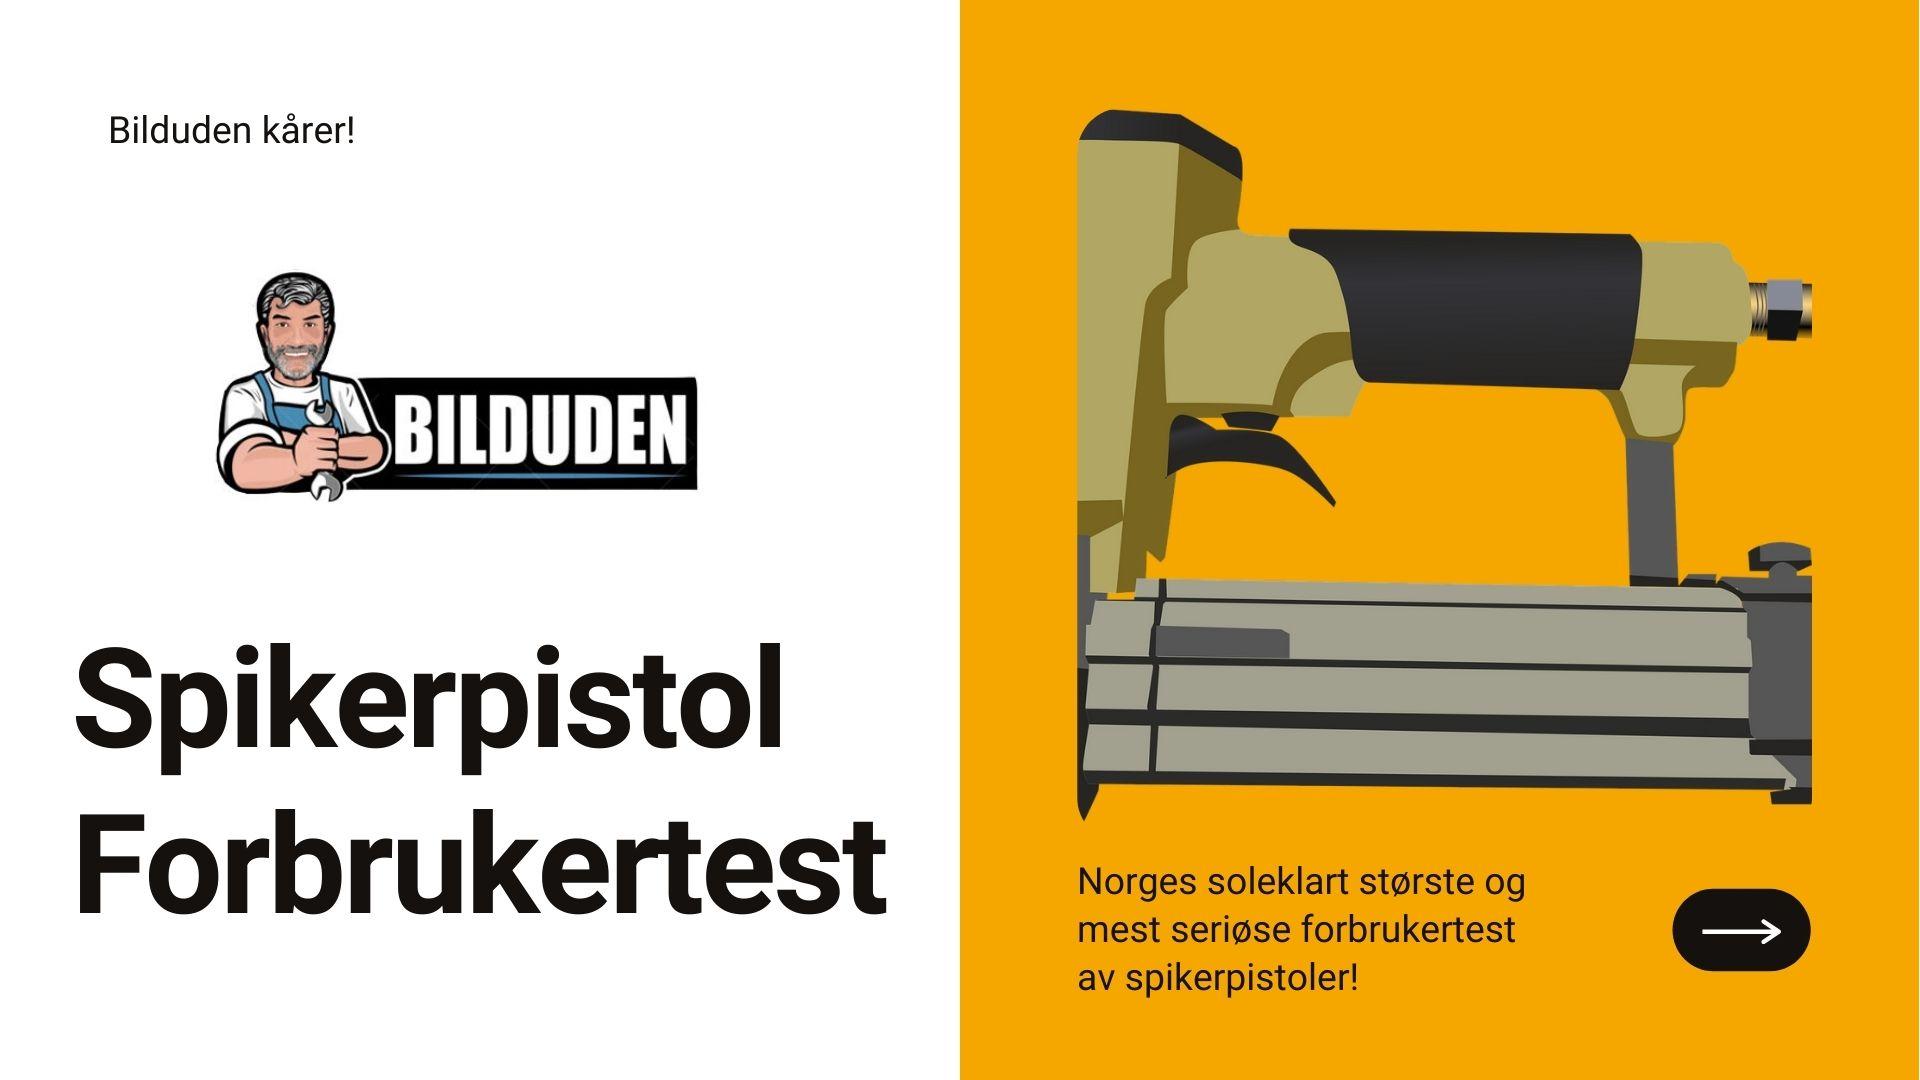 Spikerpistol test: De beste 8 spikerpistolene for byggeprosjekter